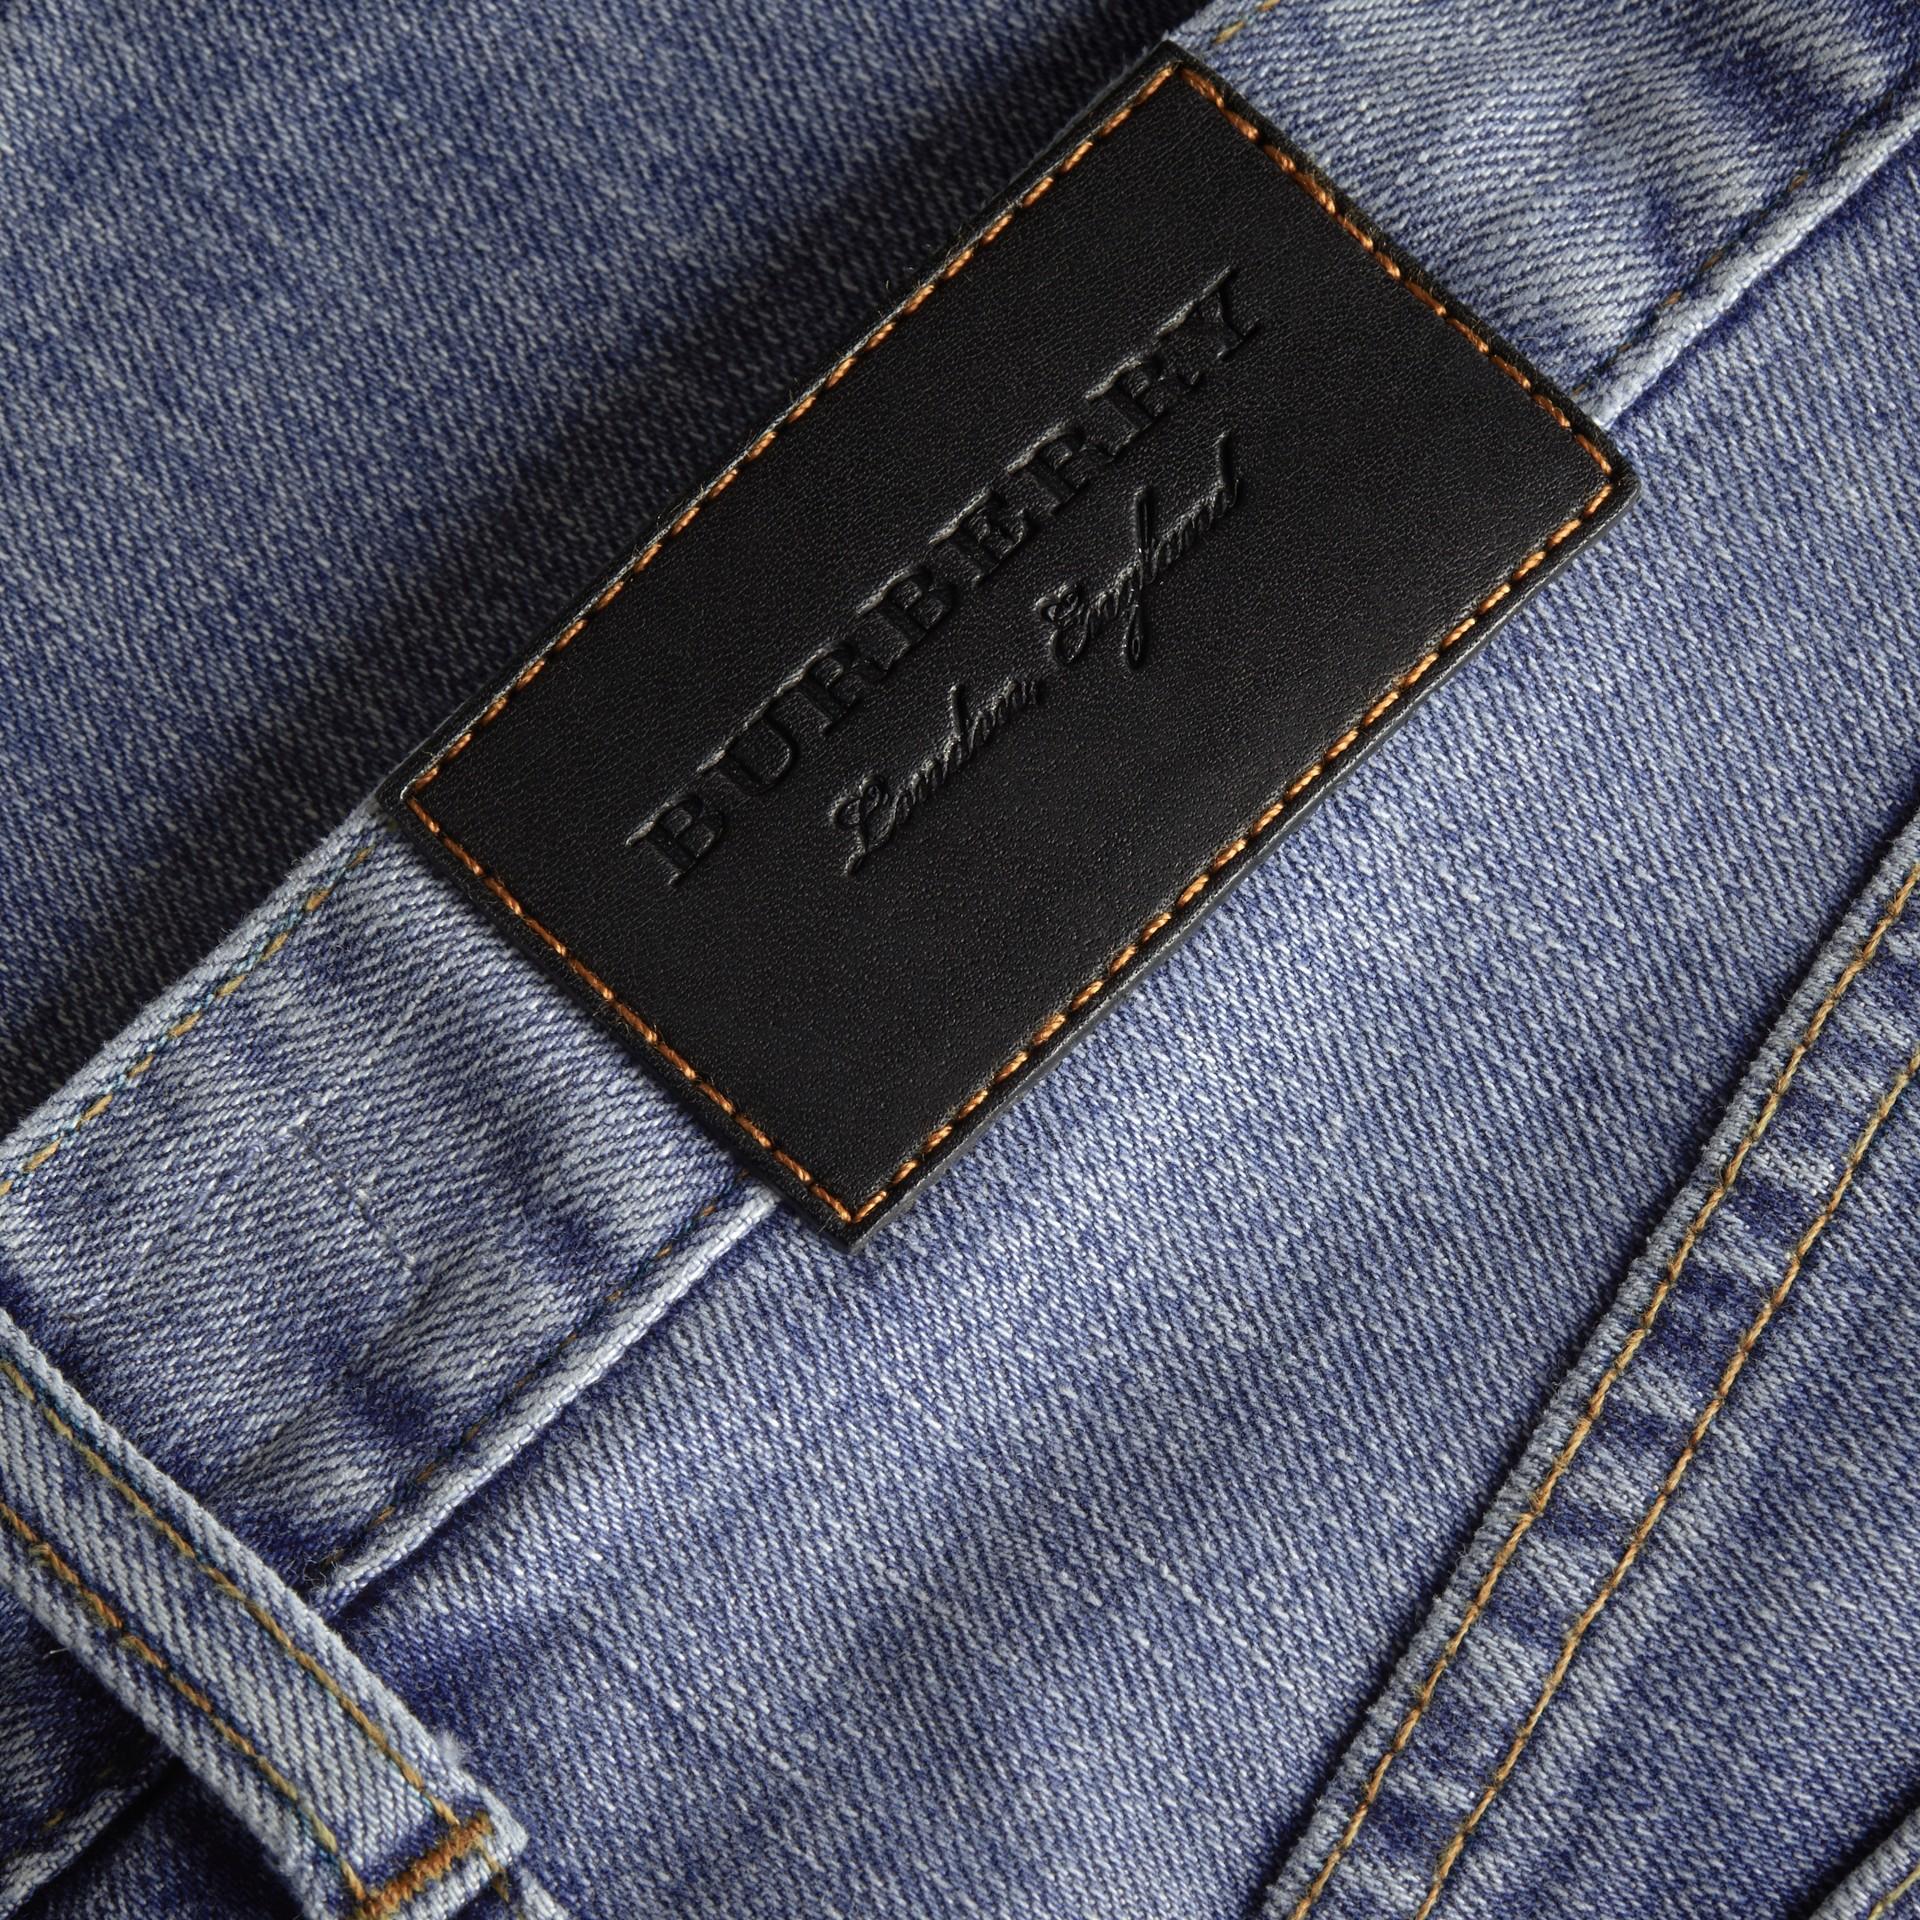 Slim Fit Seam Detail Japanese Denim Jeans - gallery image 2